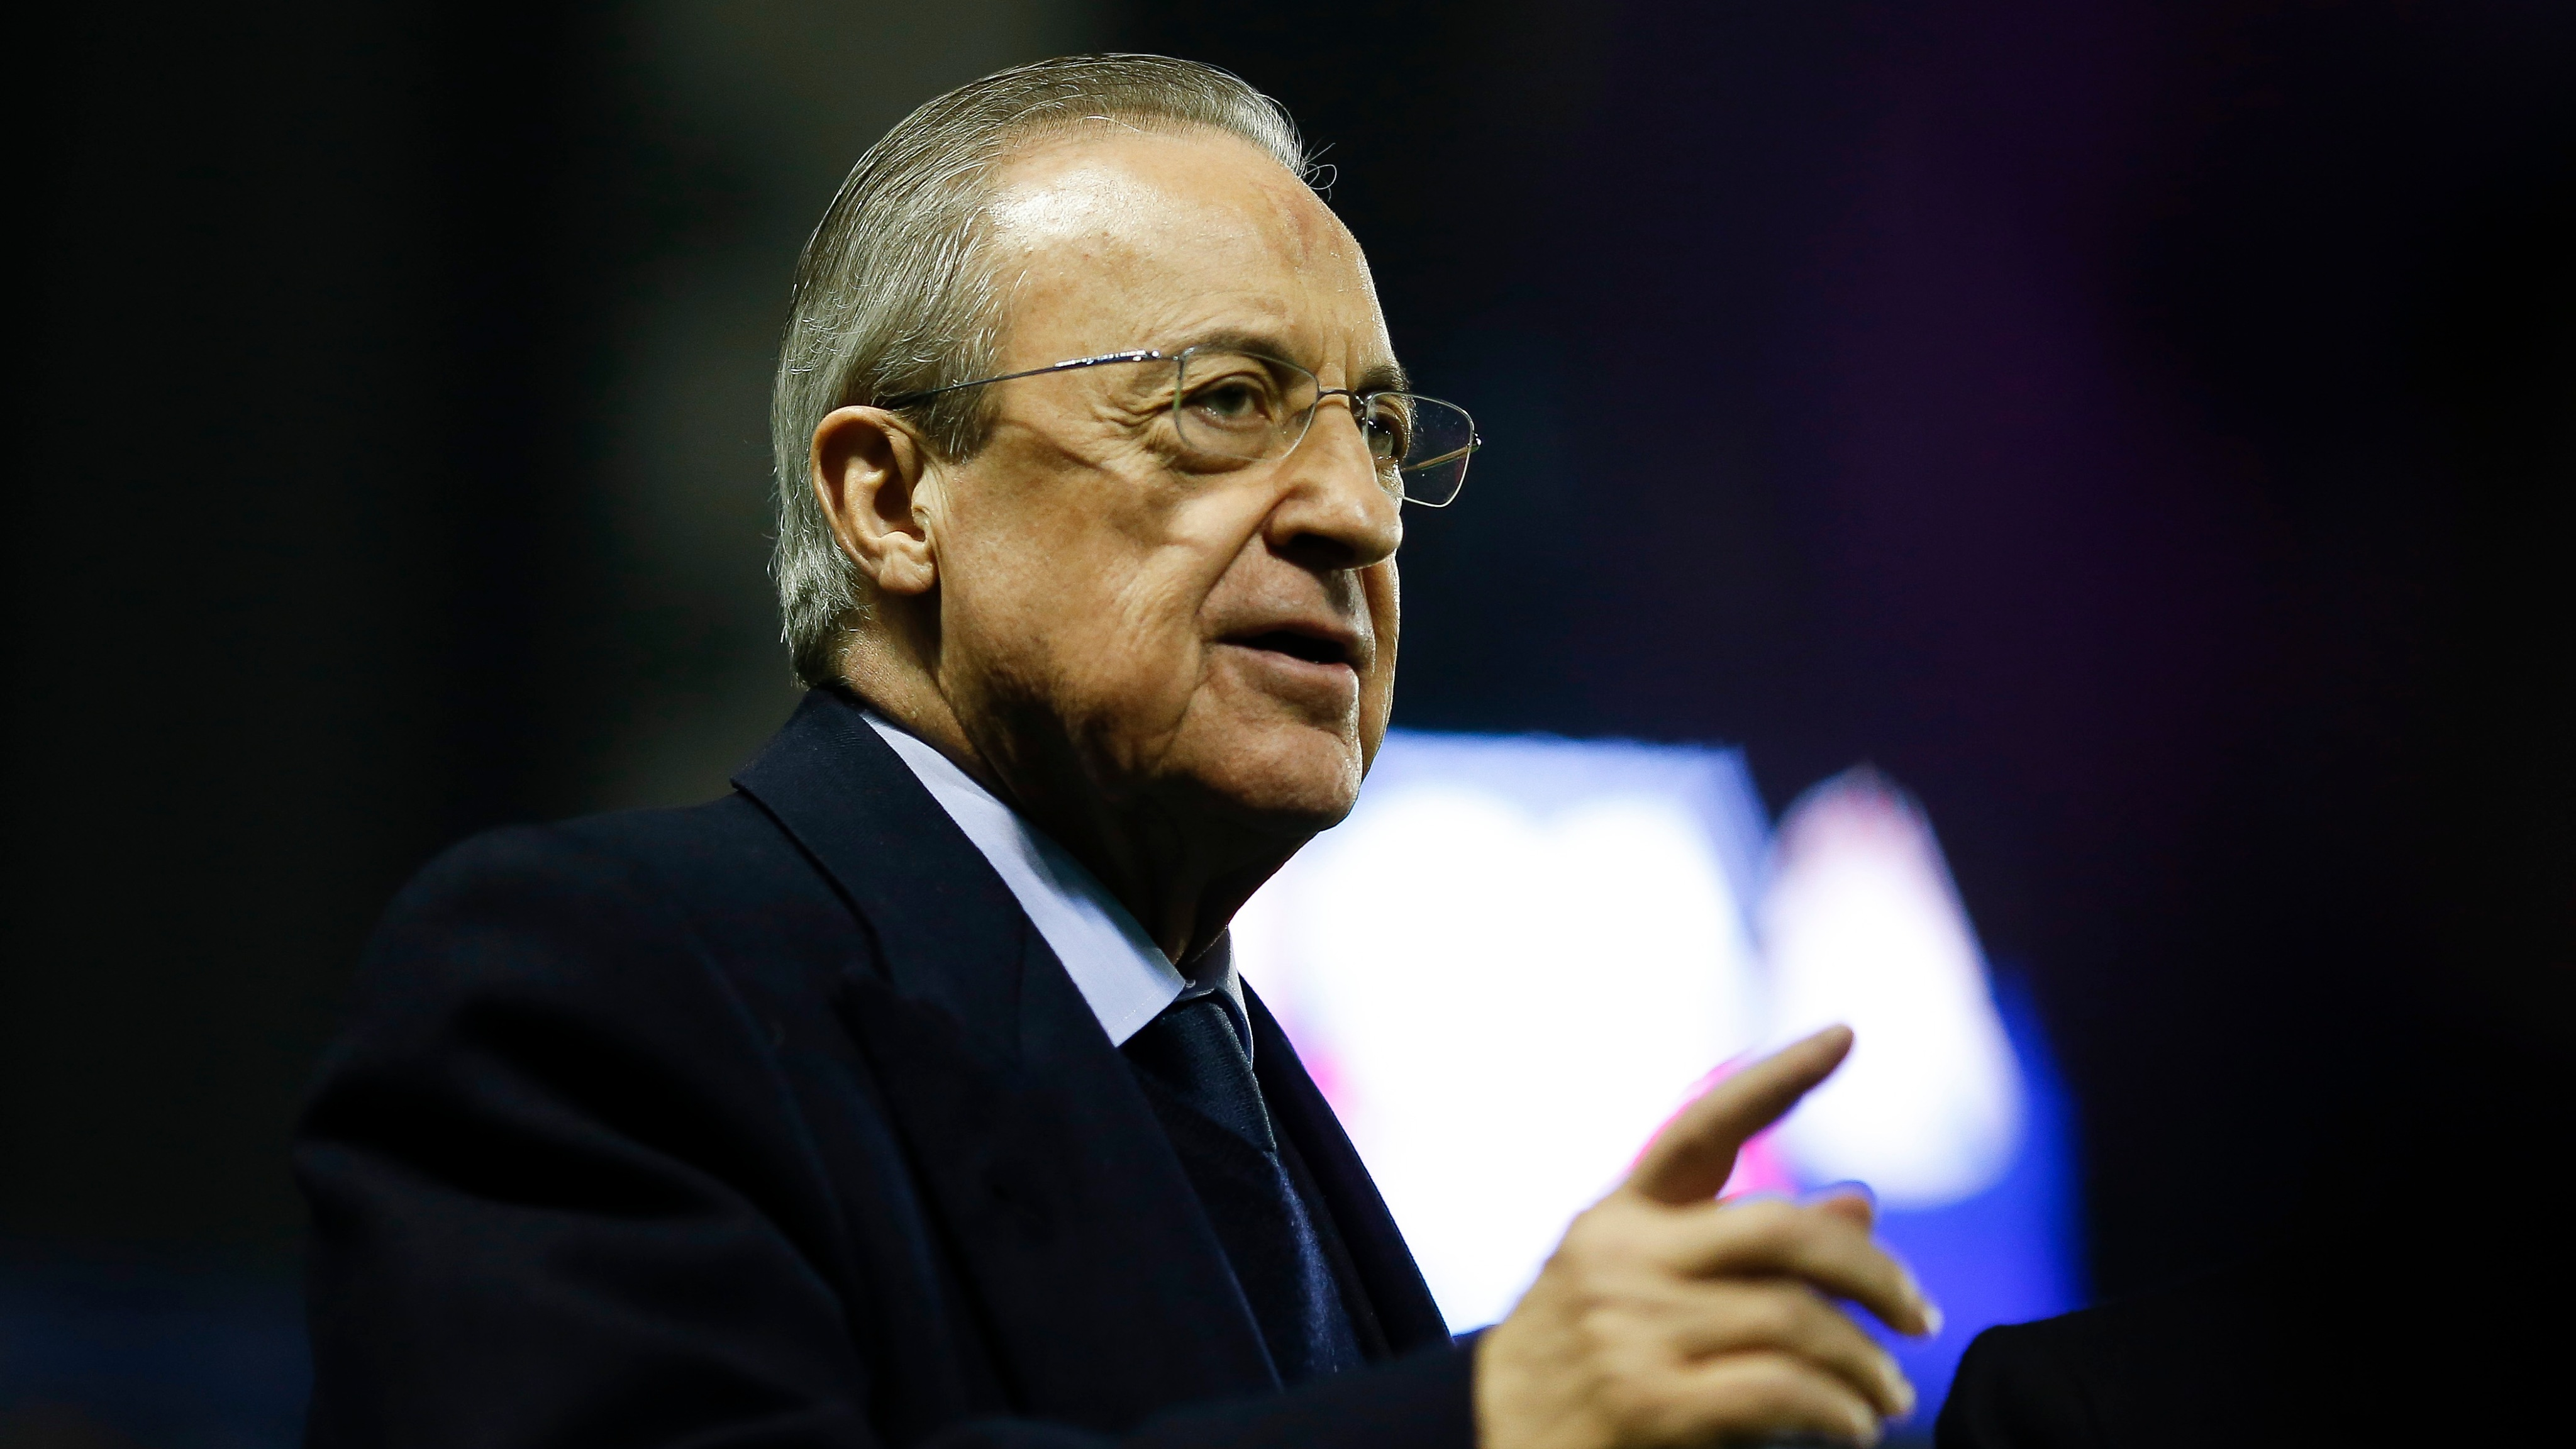 Real Madrid speak out against €2.7bn La Liga investment deal